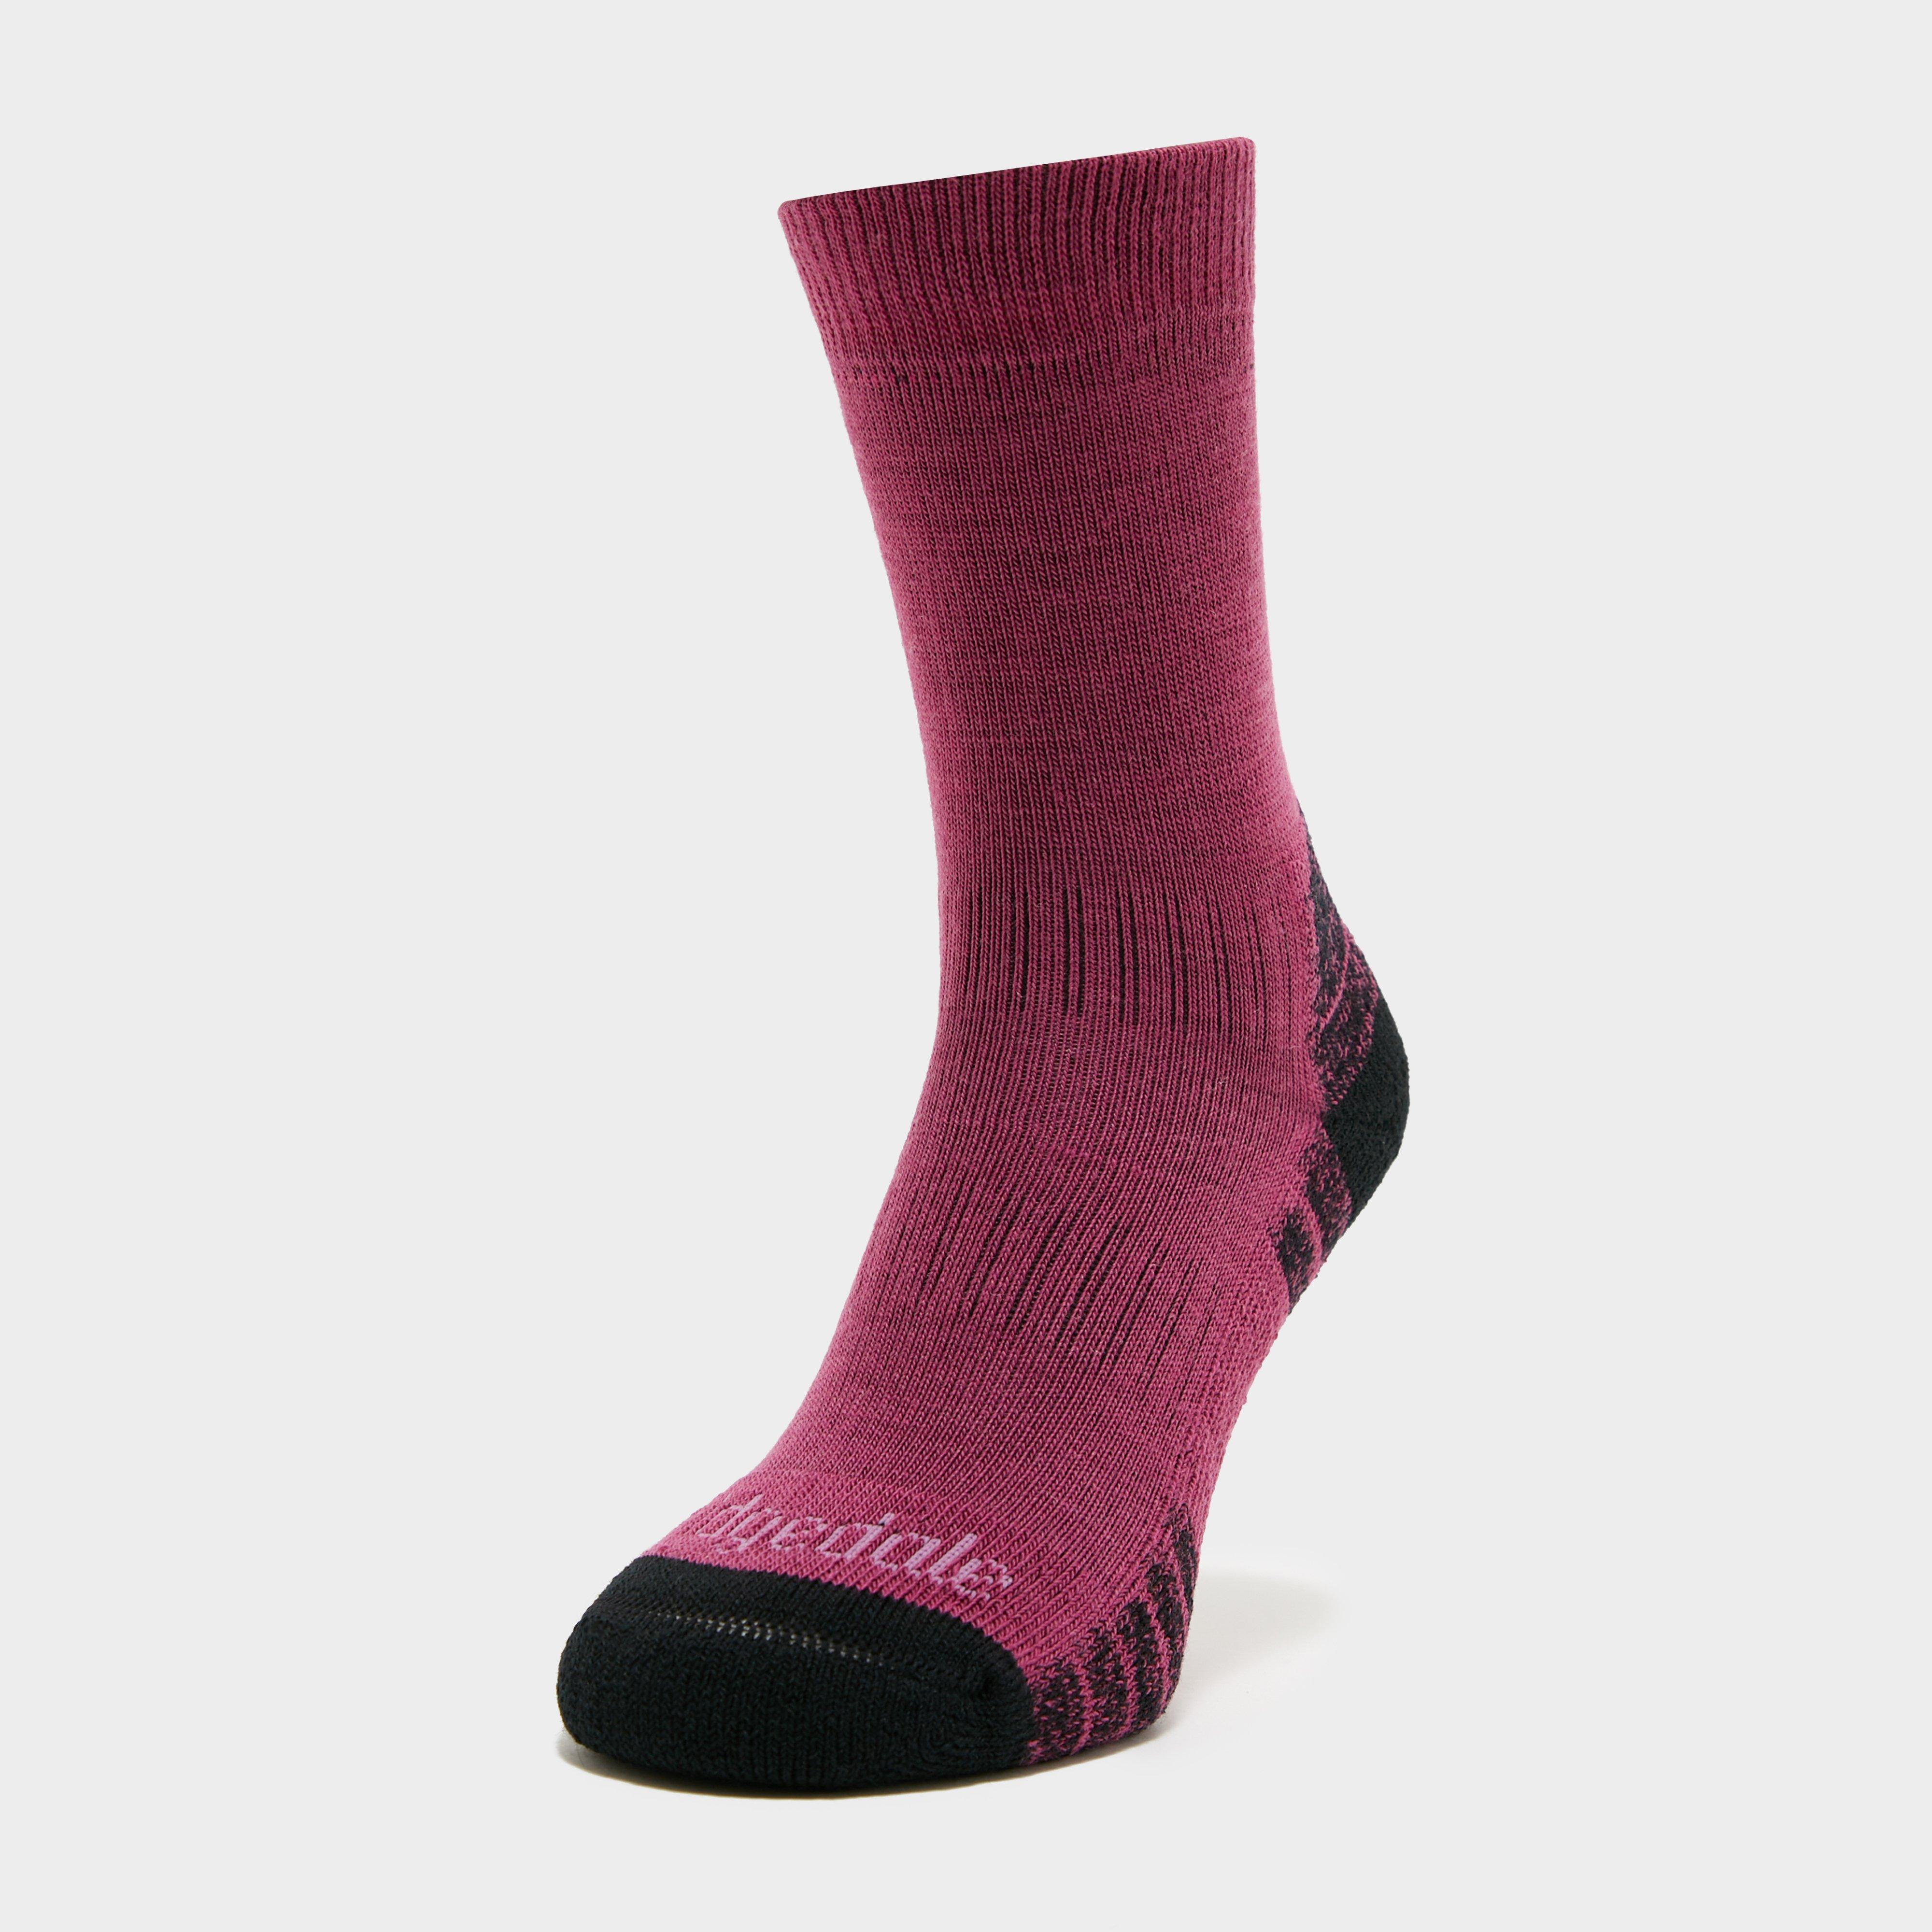 Bridgedale Women's HIKE Lightweight Merino Performance Socks, Purple